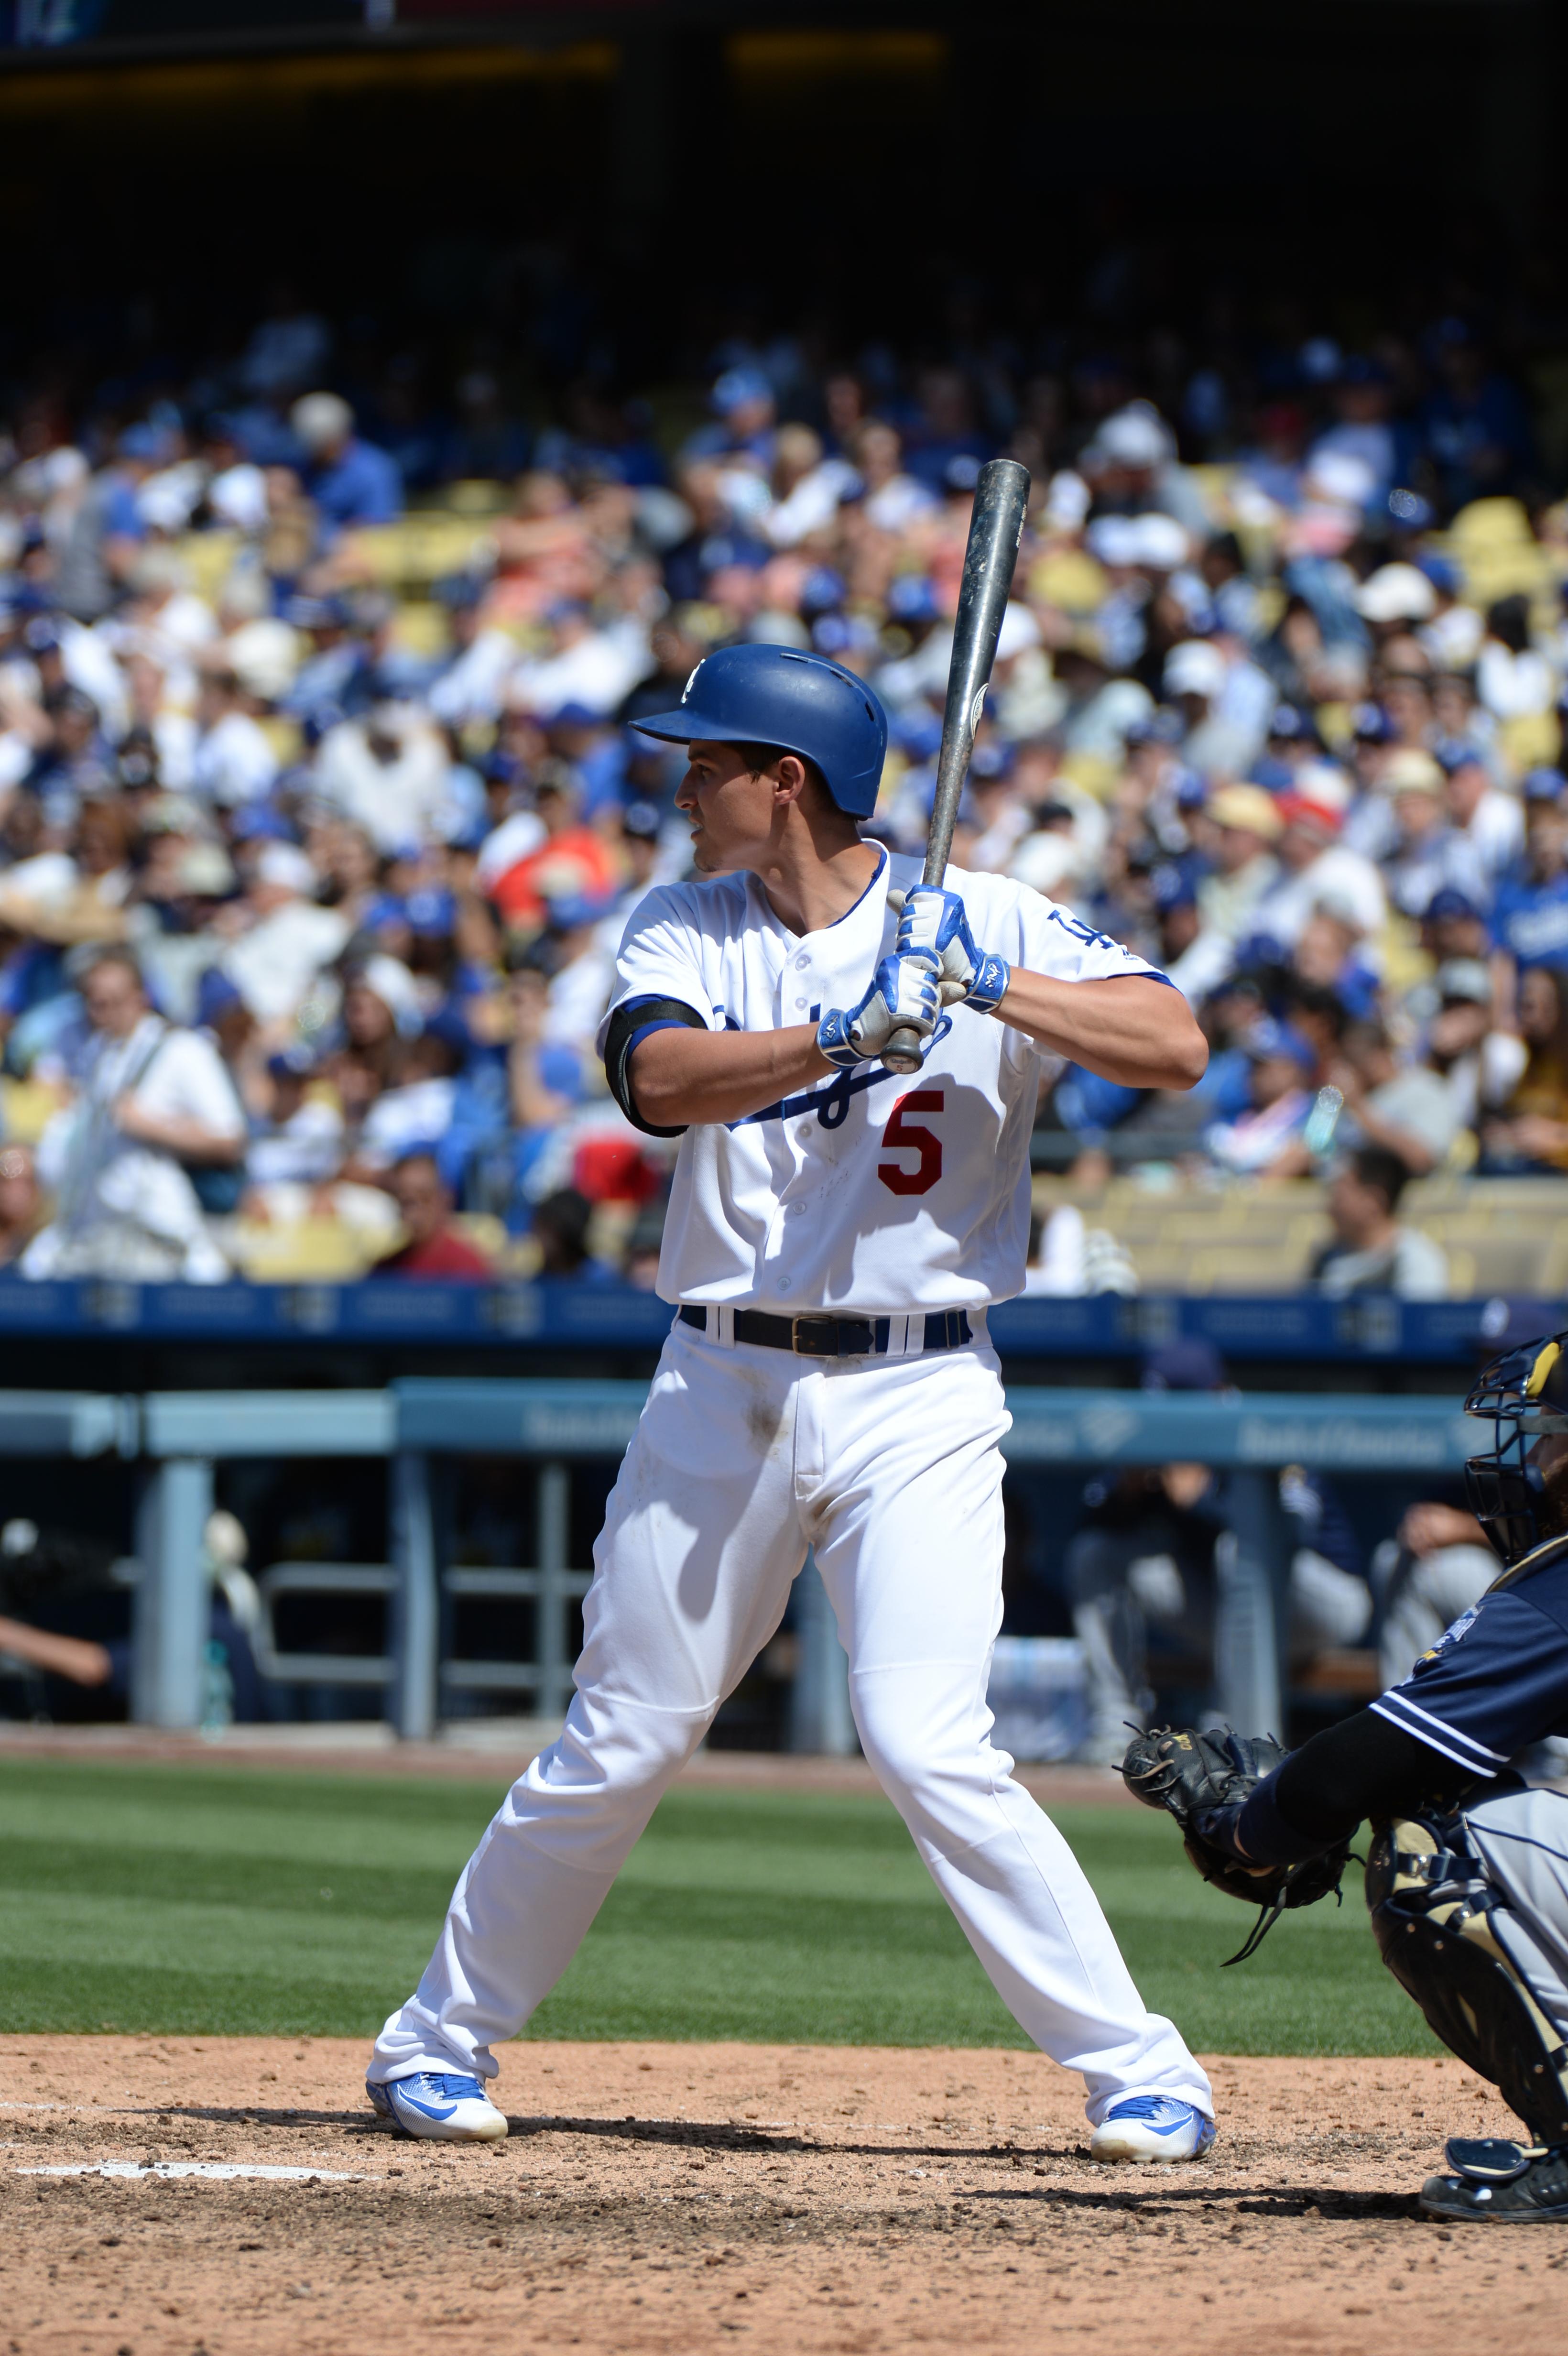 Hot-hitting Corey Seager puts his best foot backward « Dodger Insider